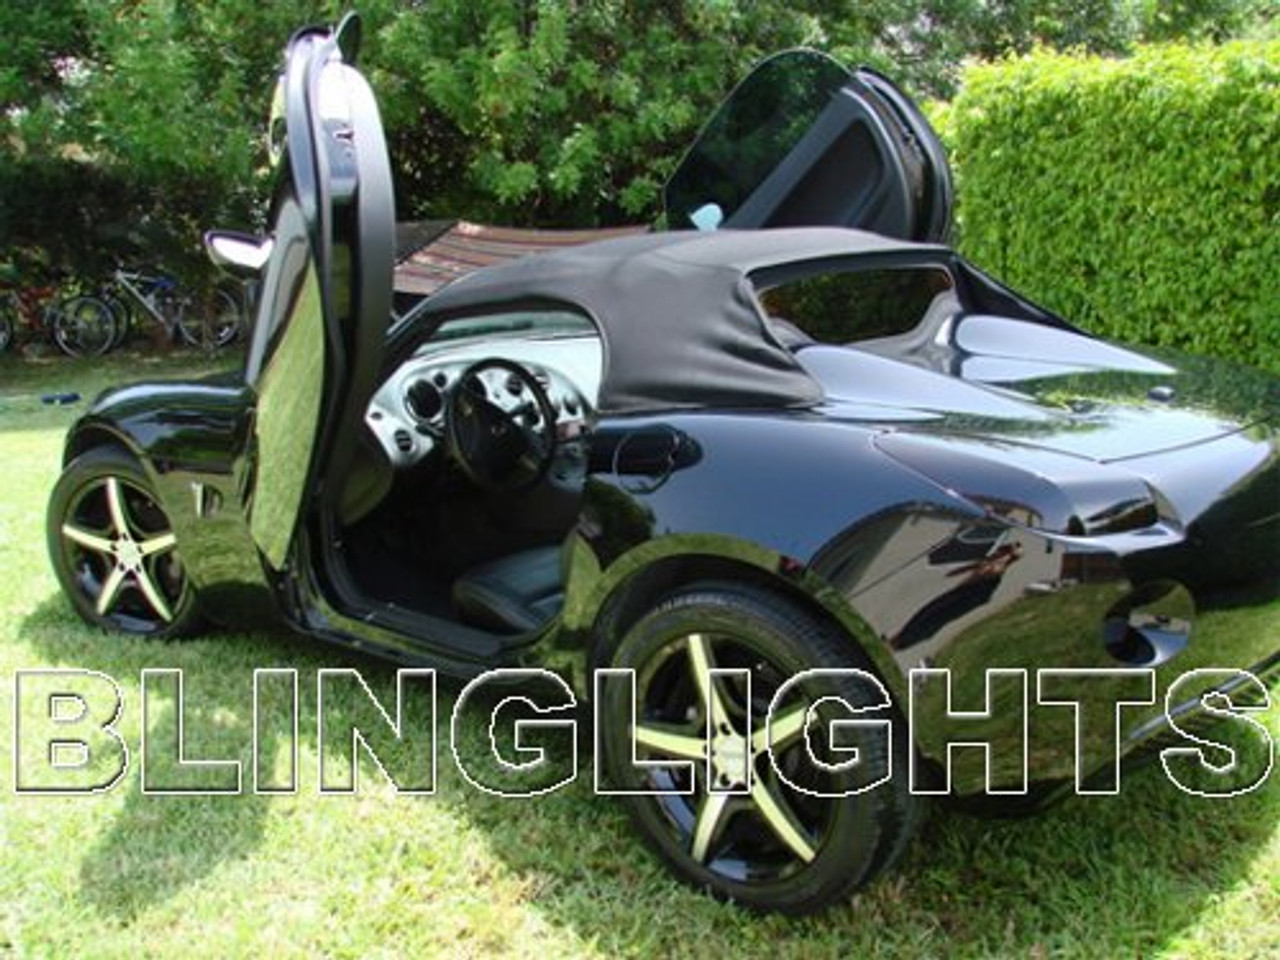 Pontiac Solstice Tinted Smoked Tail Lamp Light Overlays Film Protection